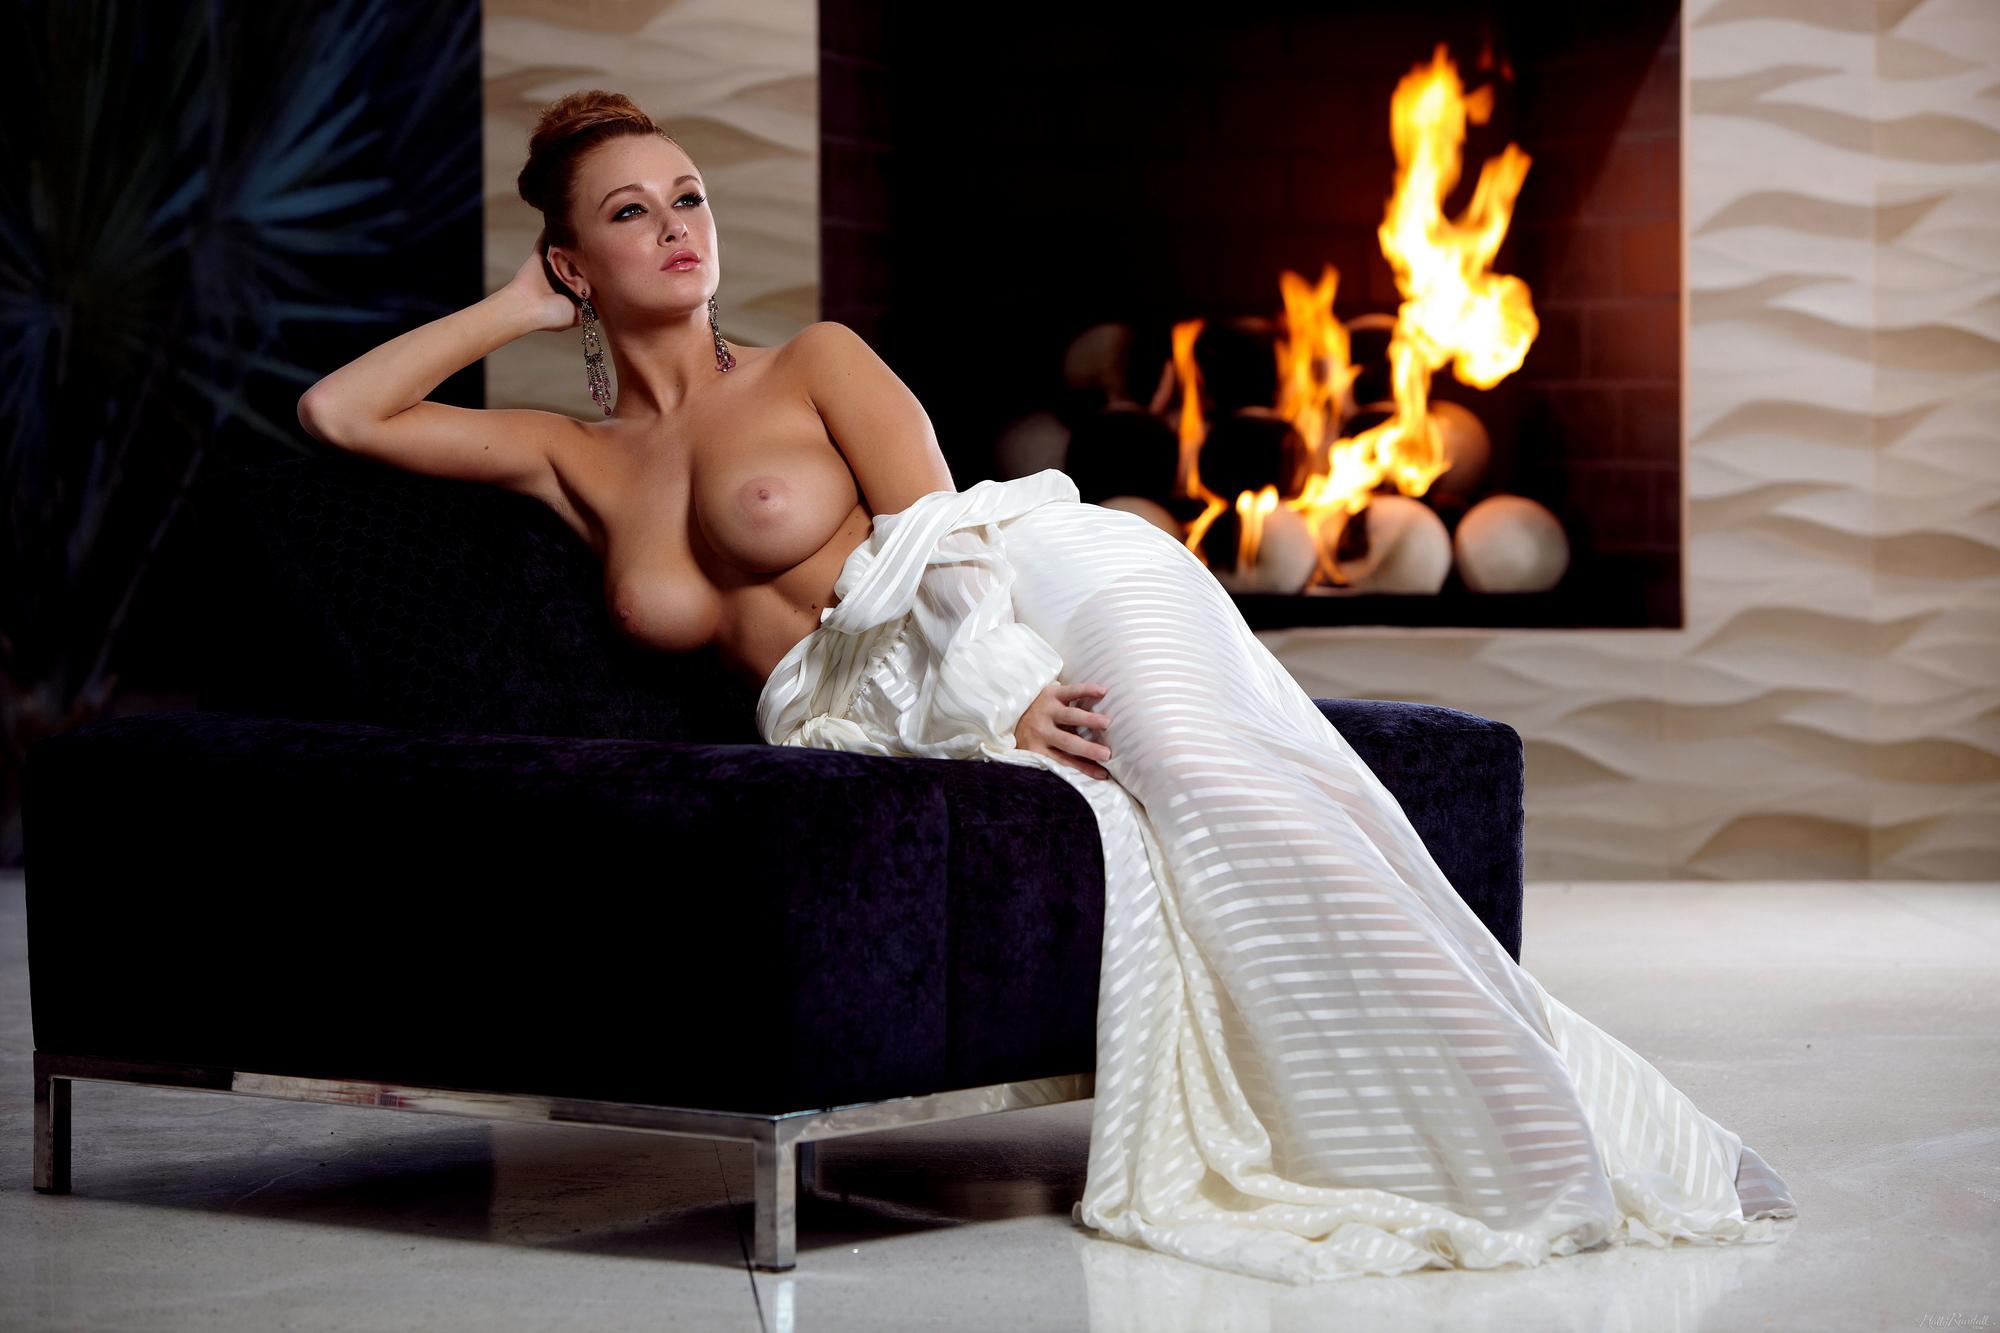 leanna-decker-nude-fireplace-redhead-hollyrandall-08